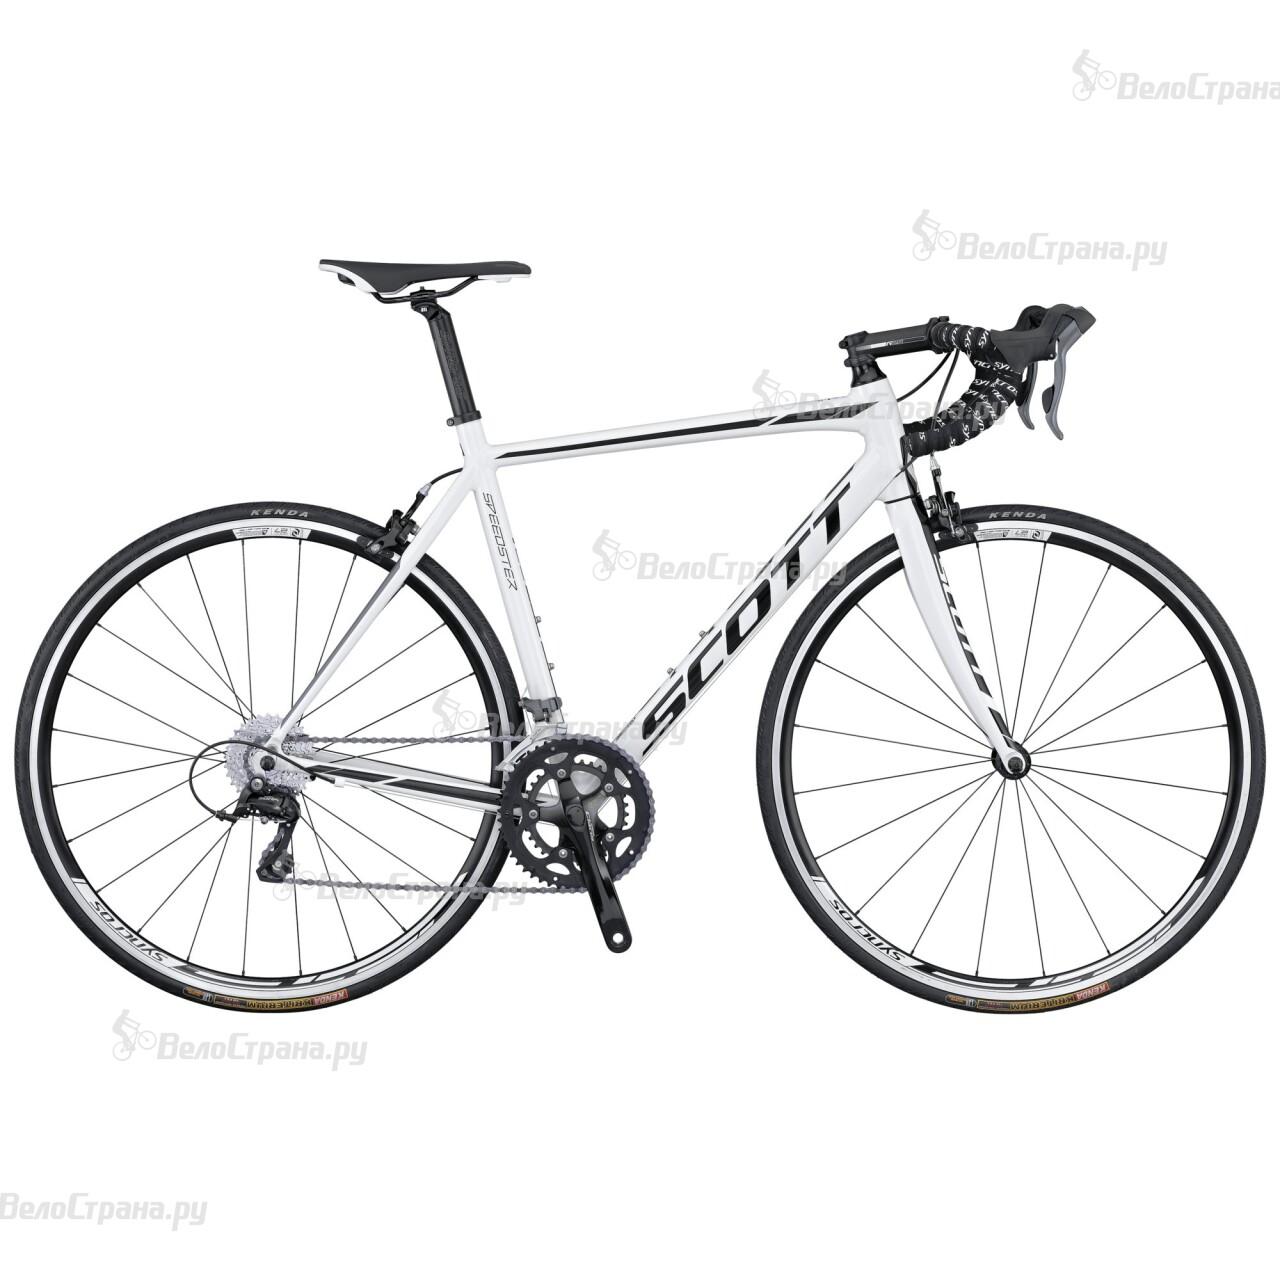 Велосипед Scott Speedster 50 16-Speed (2016)